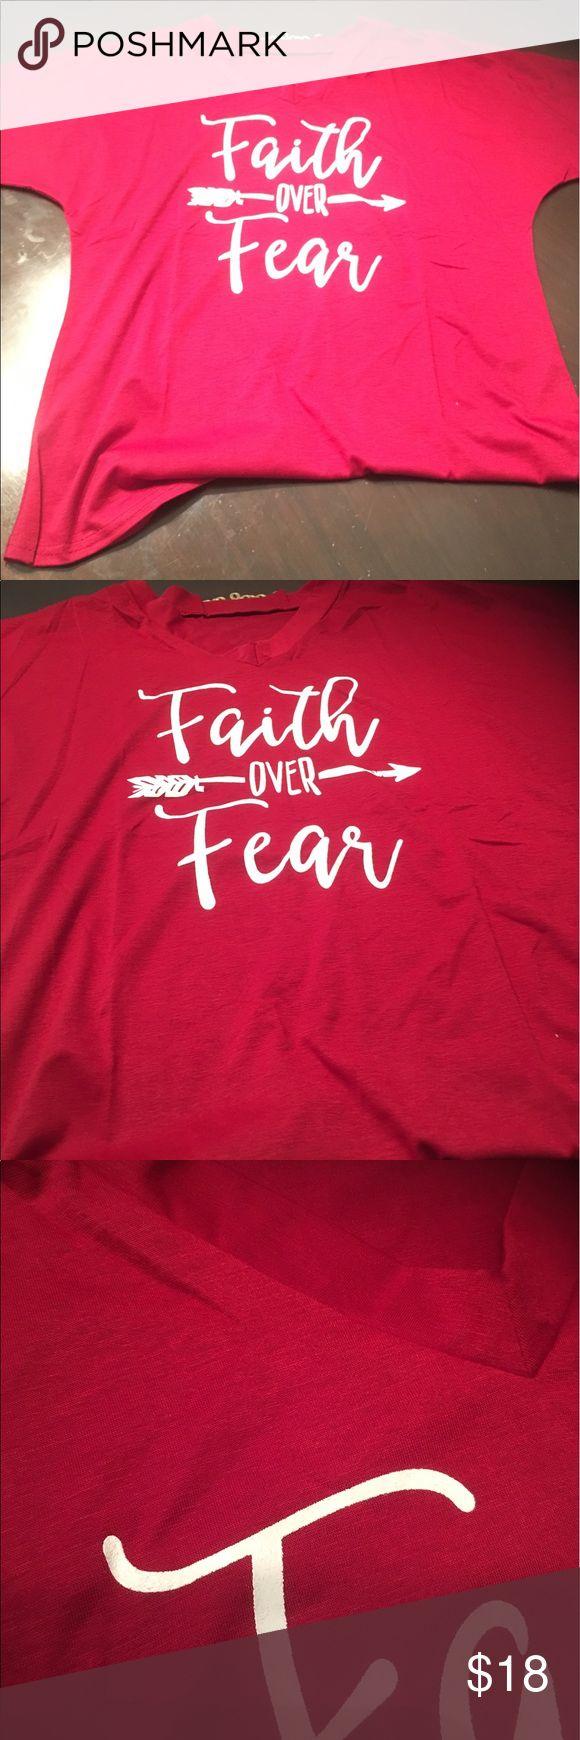 Faith over fear t shirt Small in black and white medium in black and white large in red and white xl in red and white. Good quality v neck Tops Tees - Short Sleeve